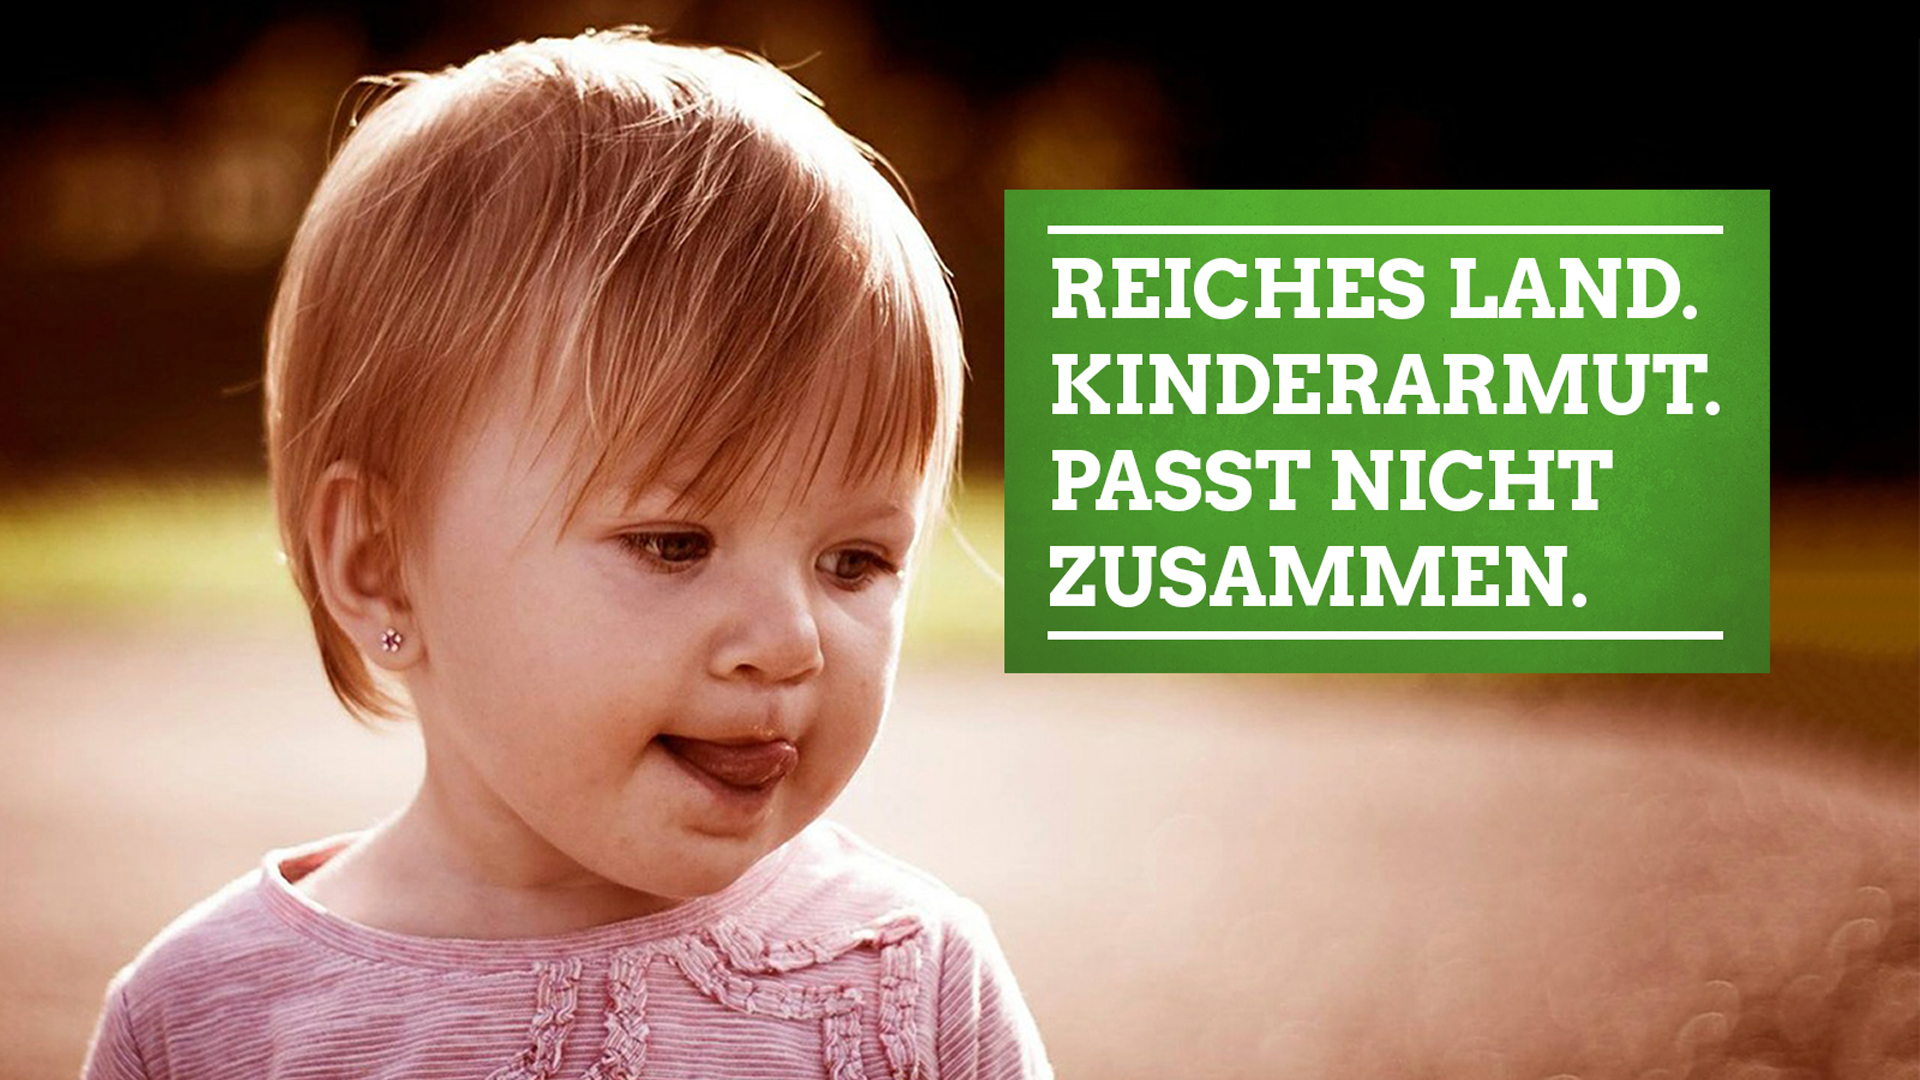 Bohm-Eisenbrandt fordert Umdenken in der Familienpolitik